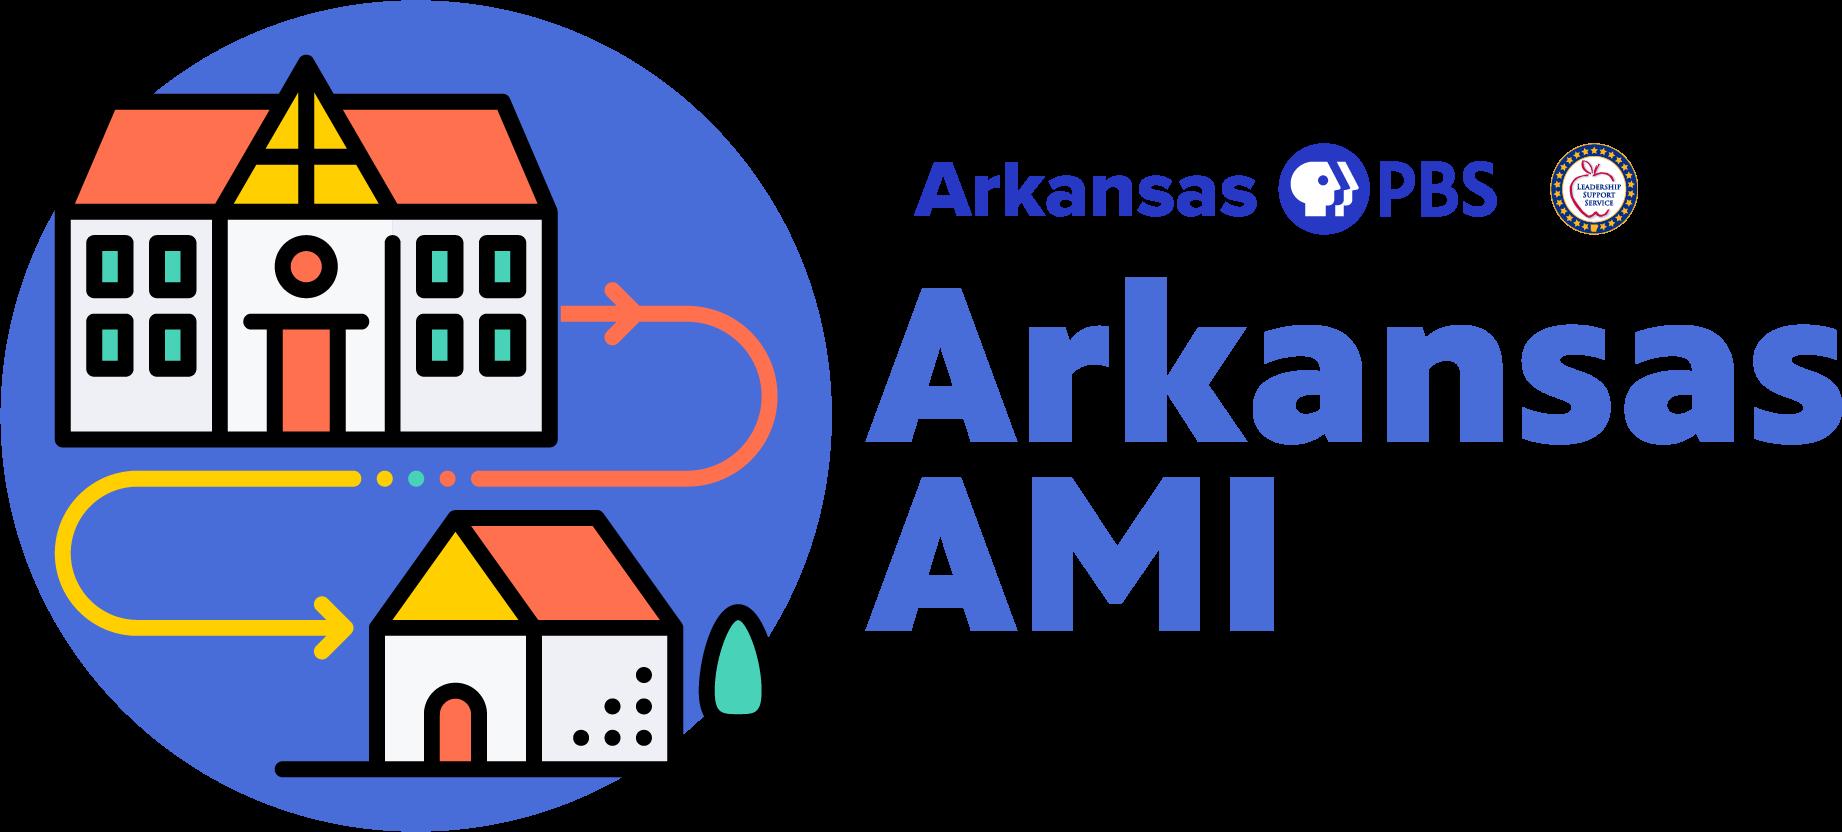 https://www.myarkansaspbs.org/__data/assets/image/0010/156394/Arkansas_AMI_WhiteBackground_Circle.png